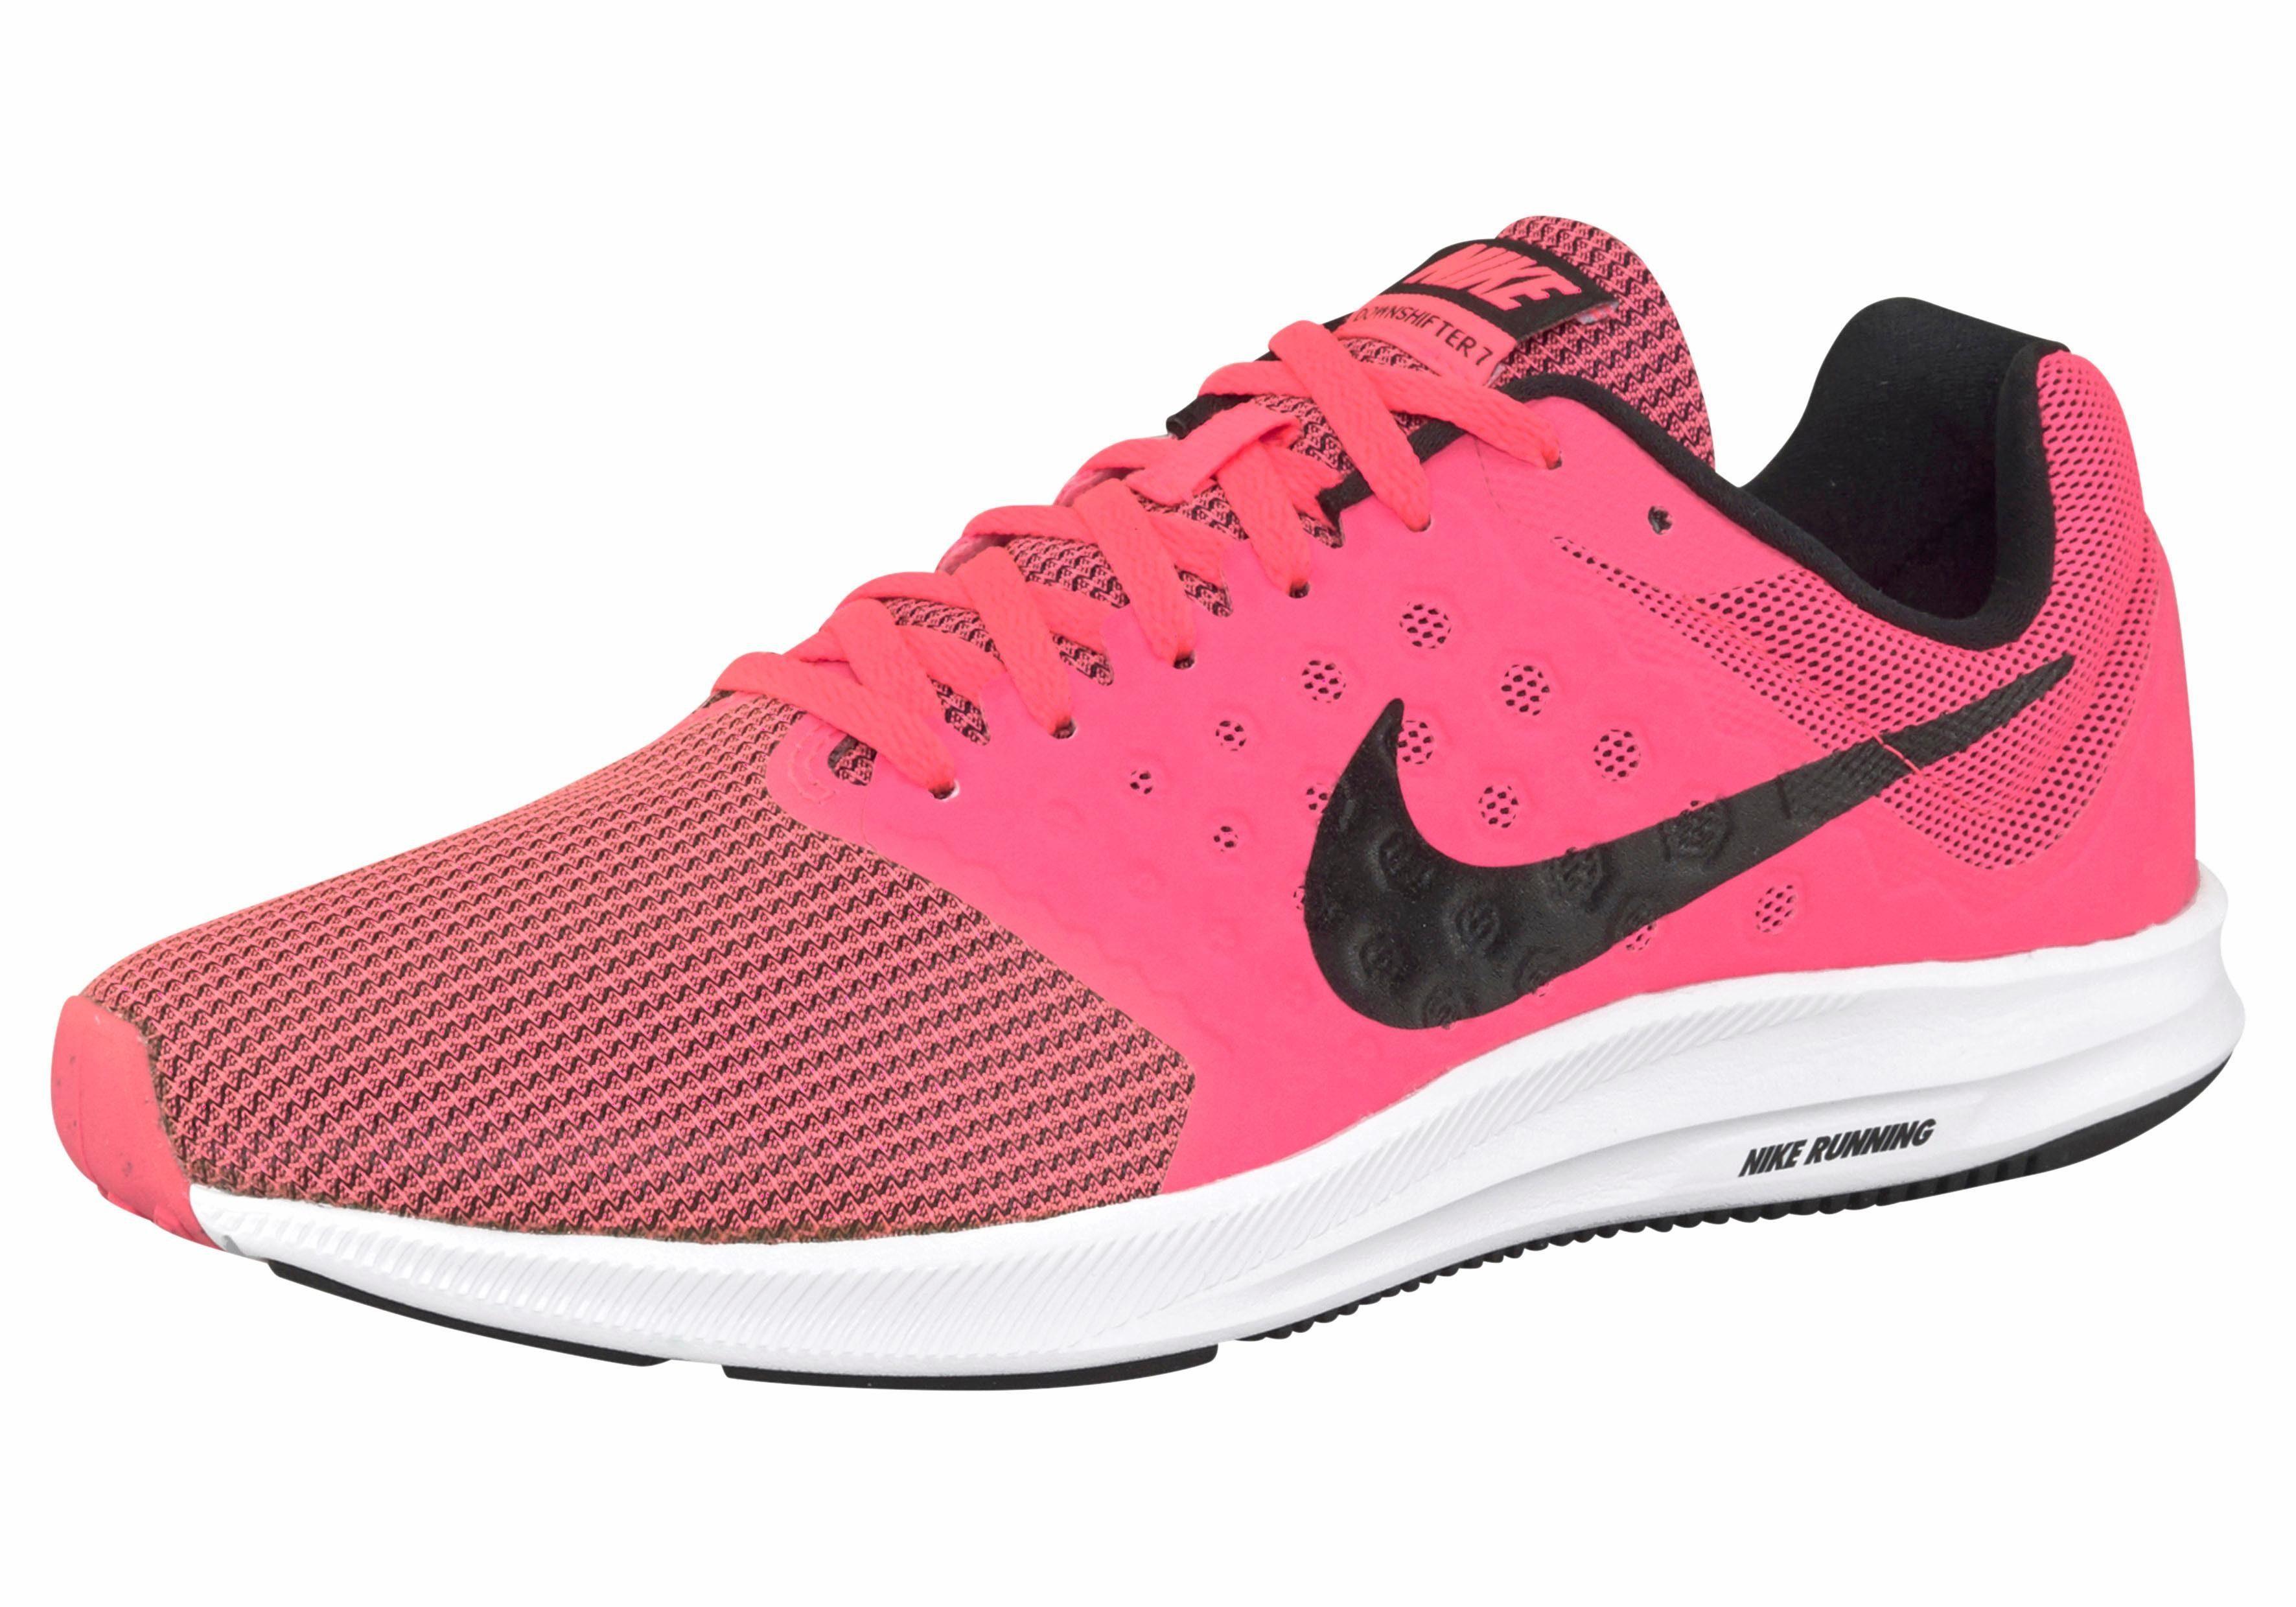 Nike Downshifter 7 Running Herren Sneaker Schwarz